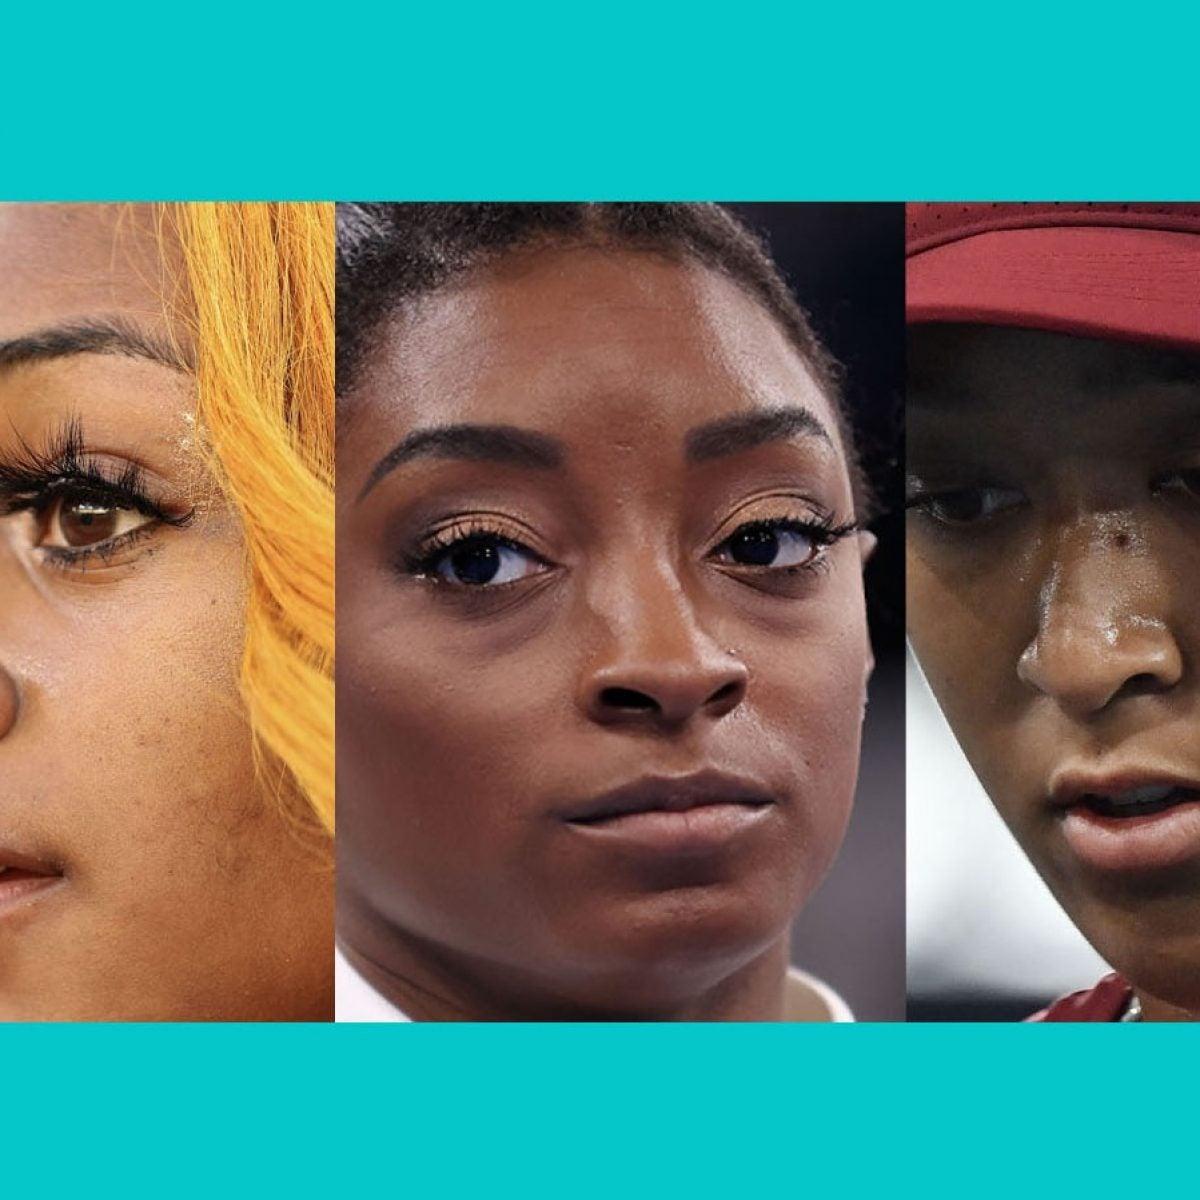 Naomi, Sha'Carri, Simone And The Burden Of Perfection